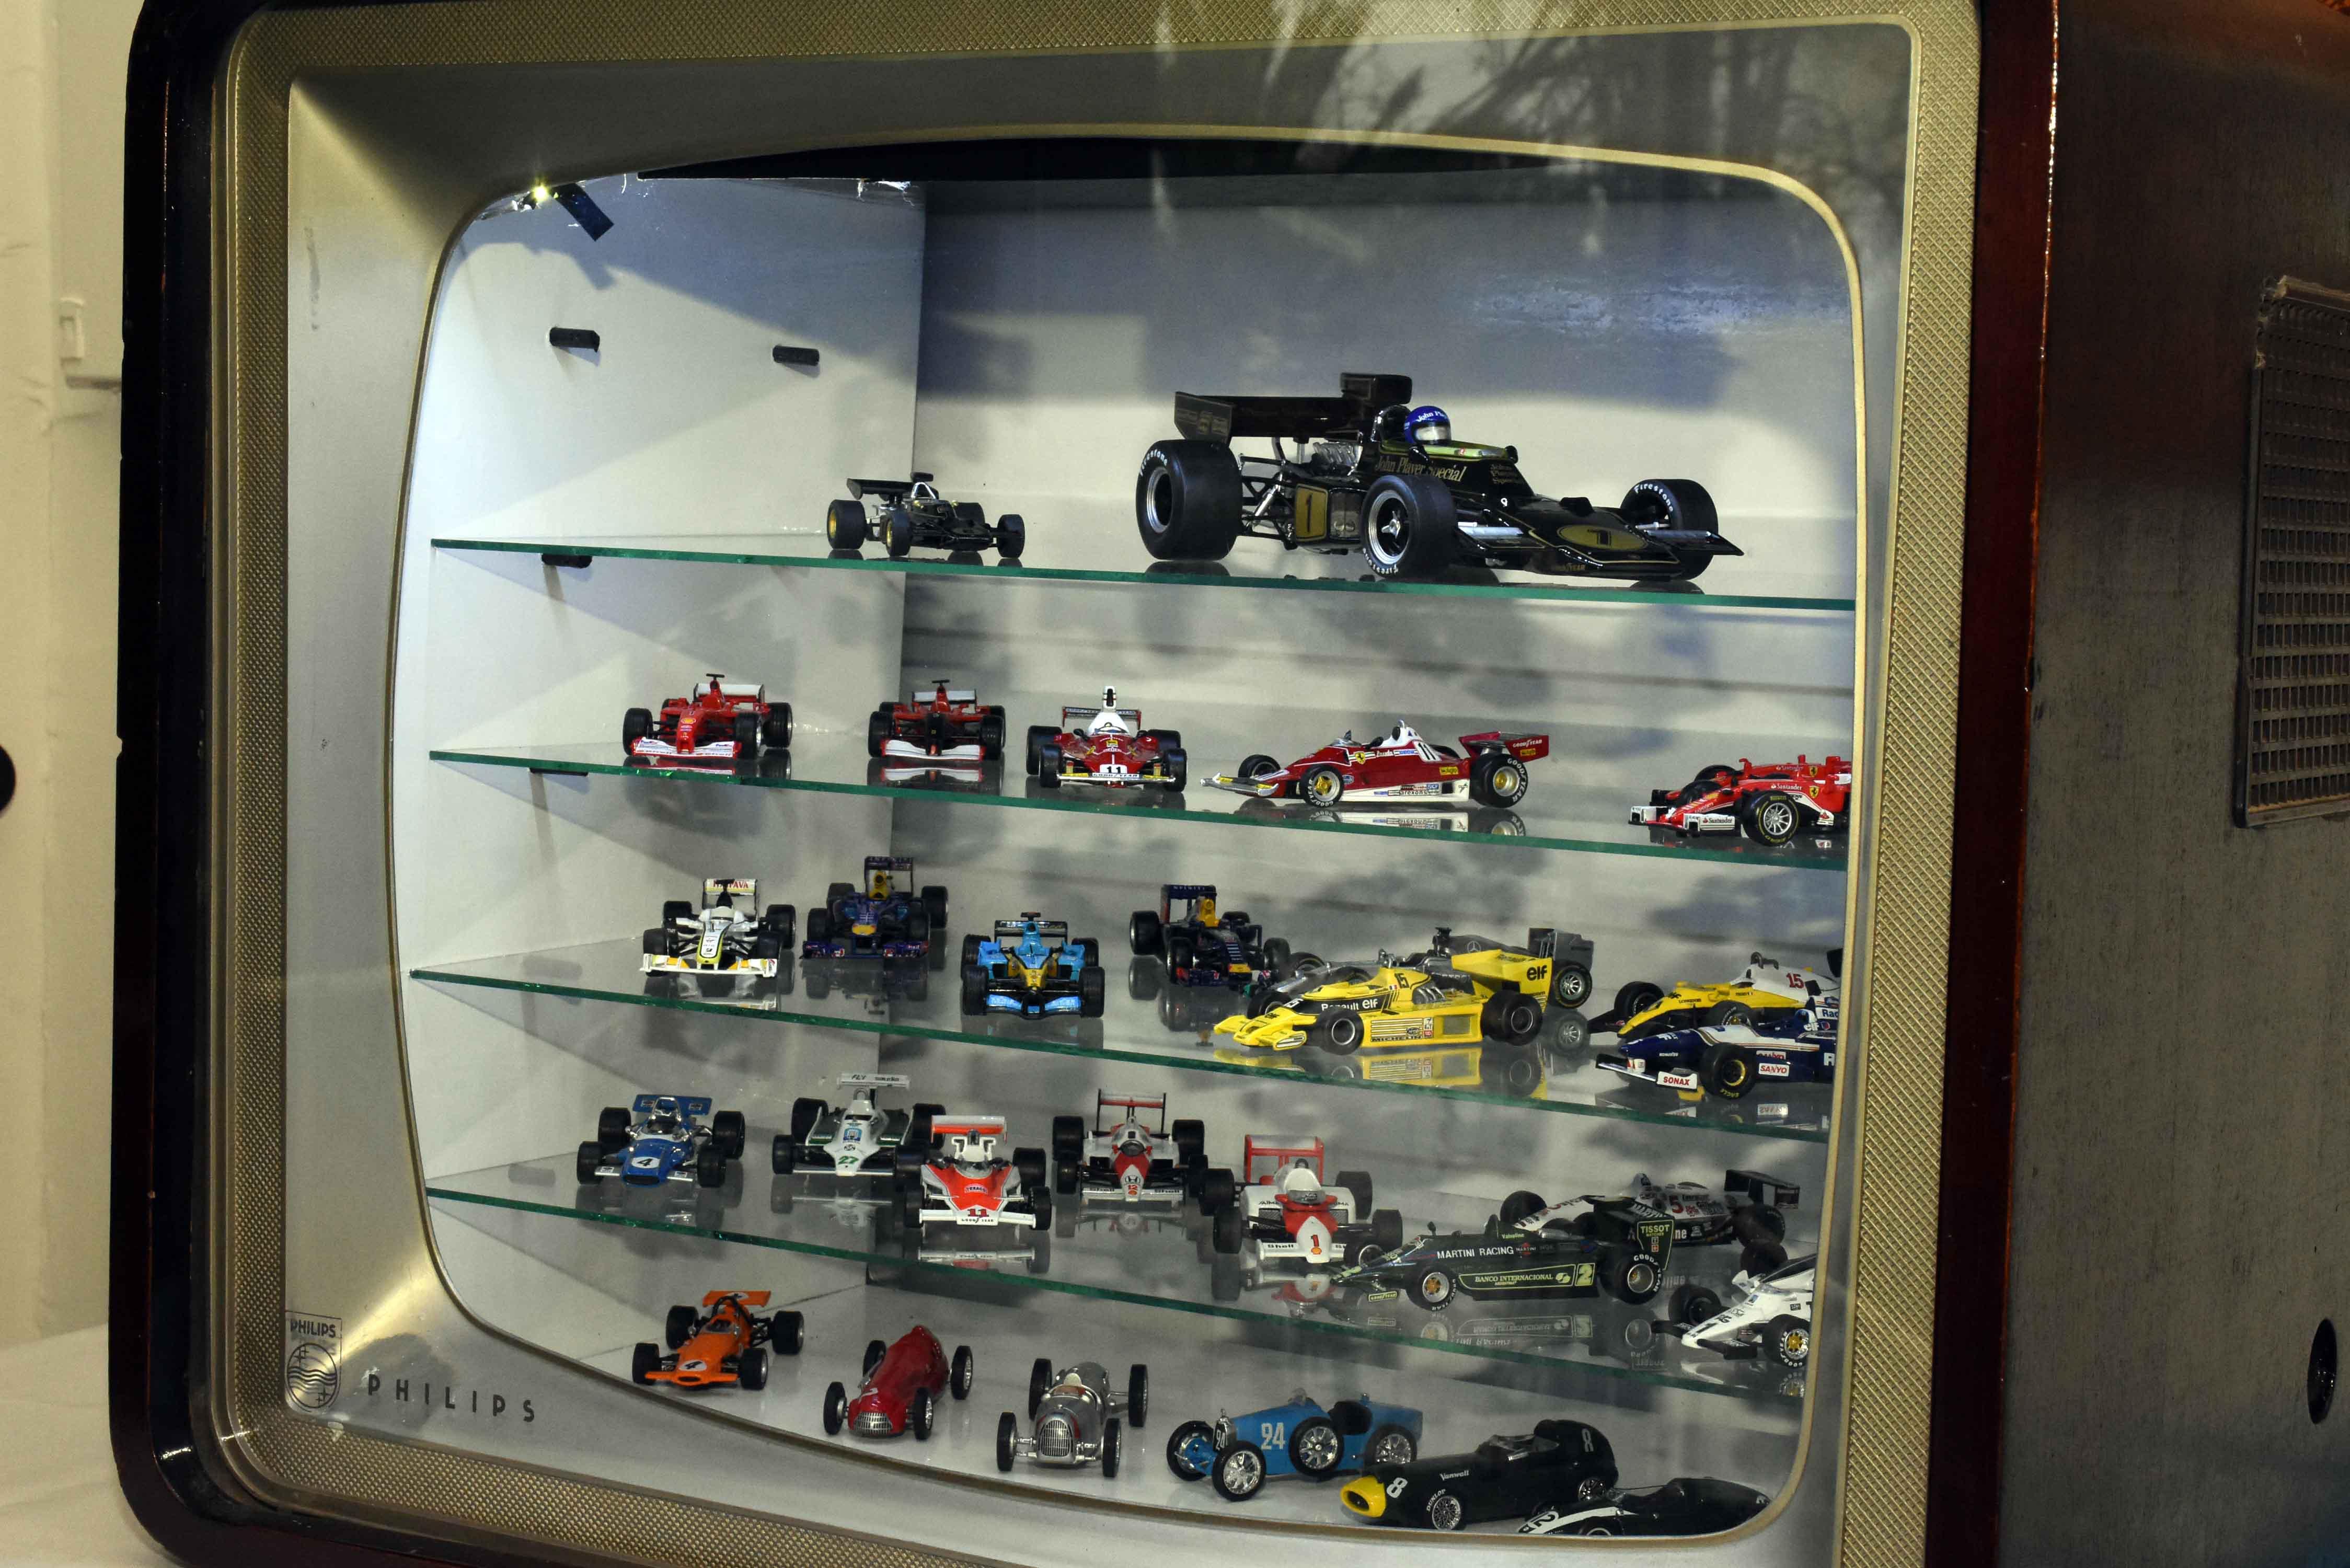 Exposición de autos a escala en La Barraca (19)